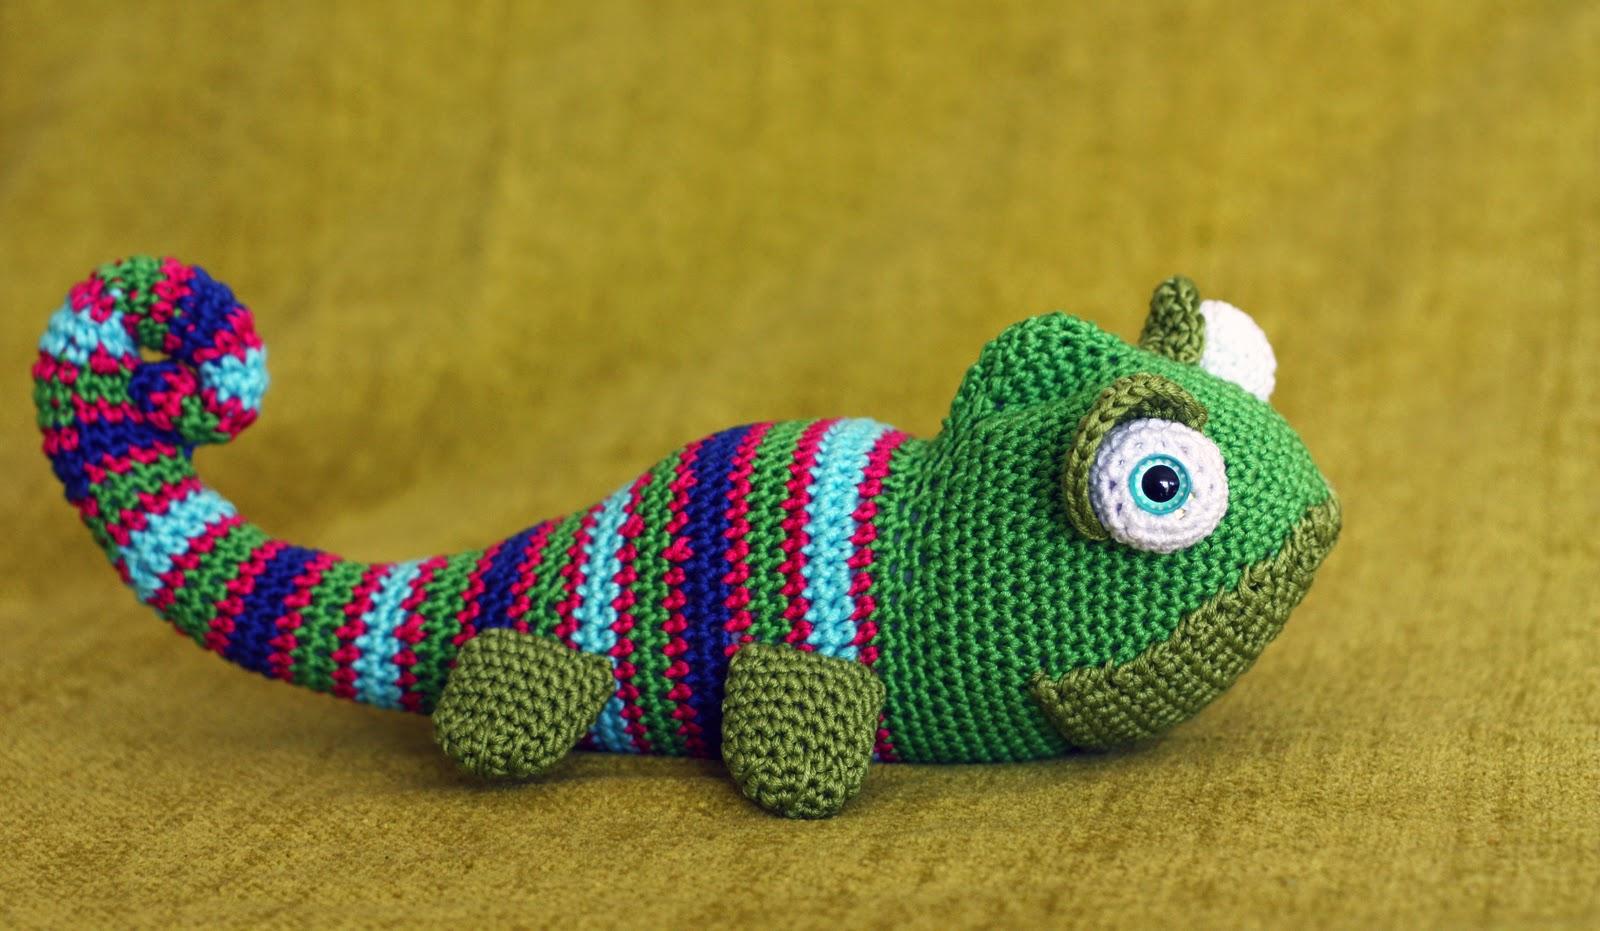 071 Amigurumi snake pattern. Crochet Christmas Snakky toy. Crochet ... | 931x1600